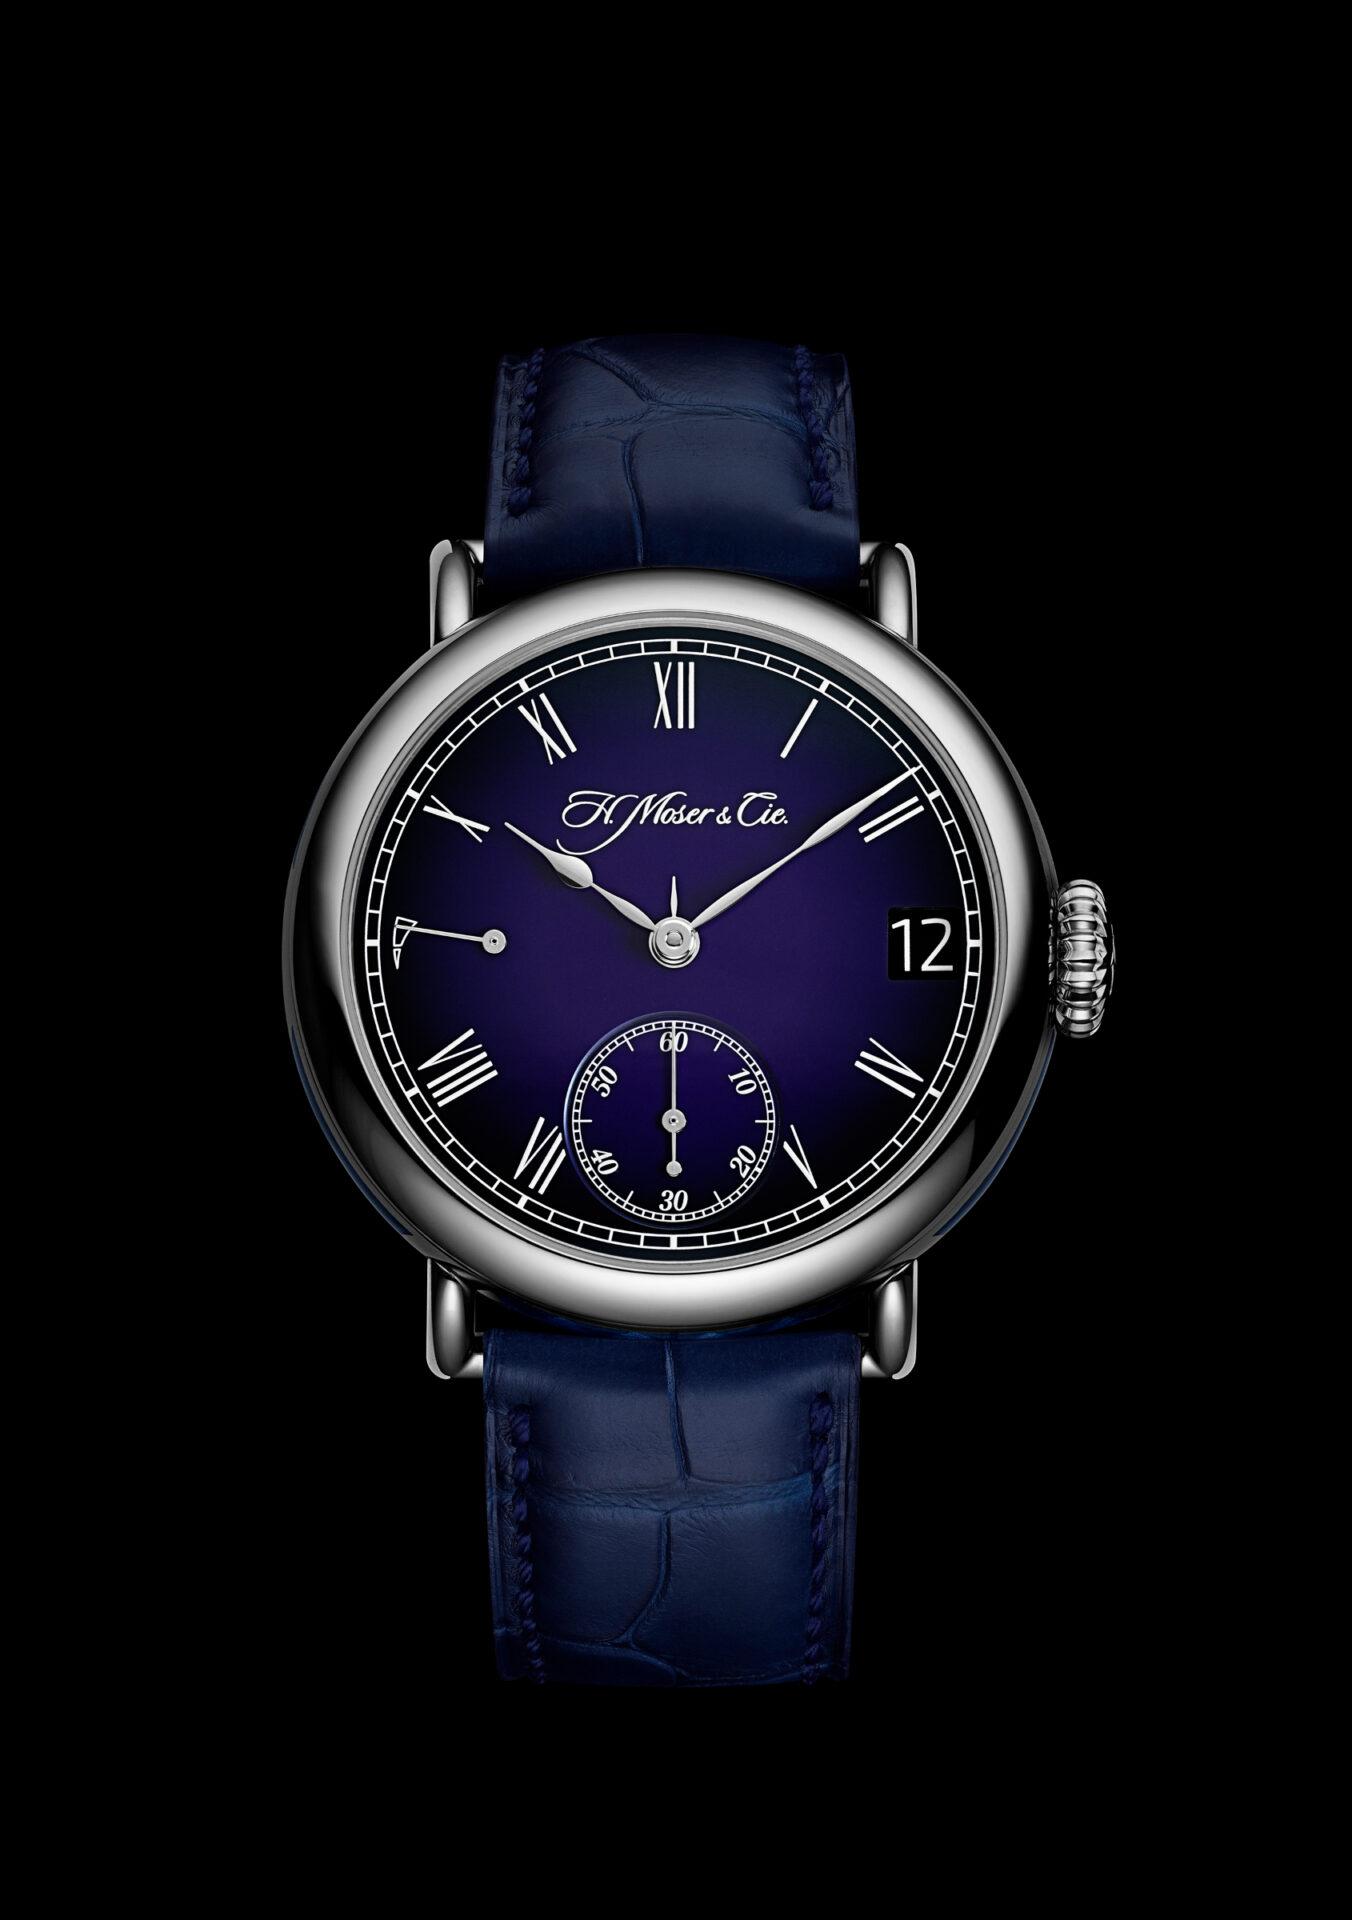 INTRODUCING: The H. Moser & Cie. Heritage Perpetual Calendar Midnight Blue Enamel